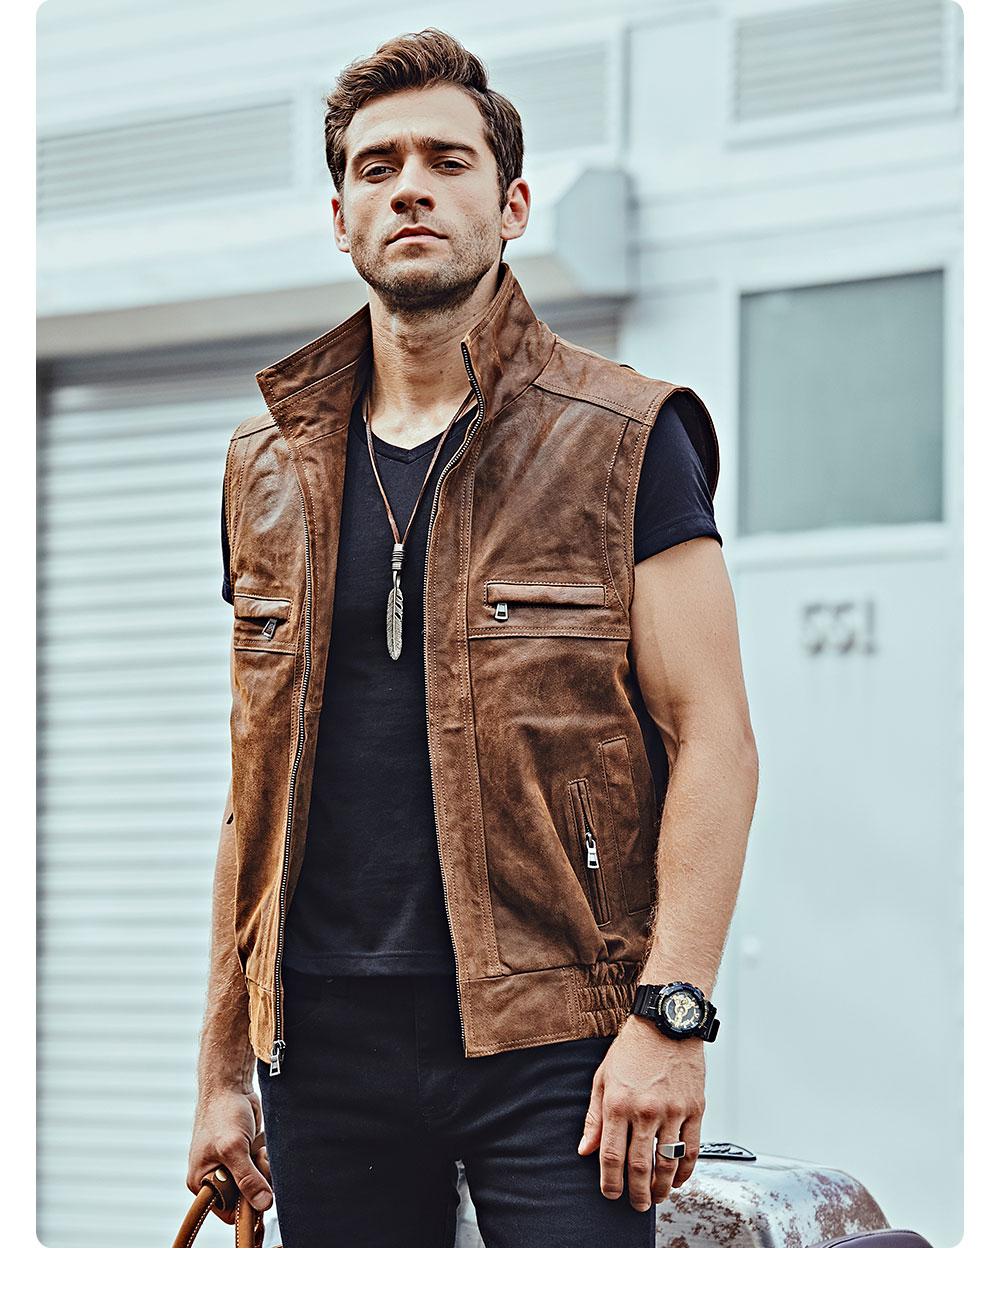 Hfdfe4b12993f4b15a09f964052472e81M Mew Men's Leather Retro Vest Stand Collar Men's Motorcycle Casual Vest